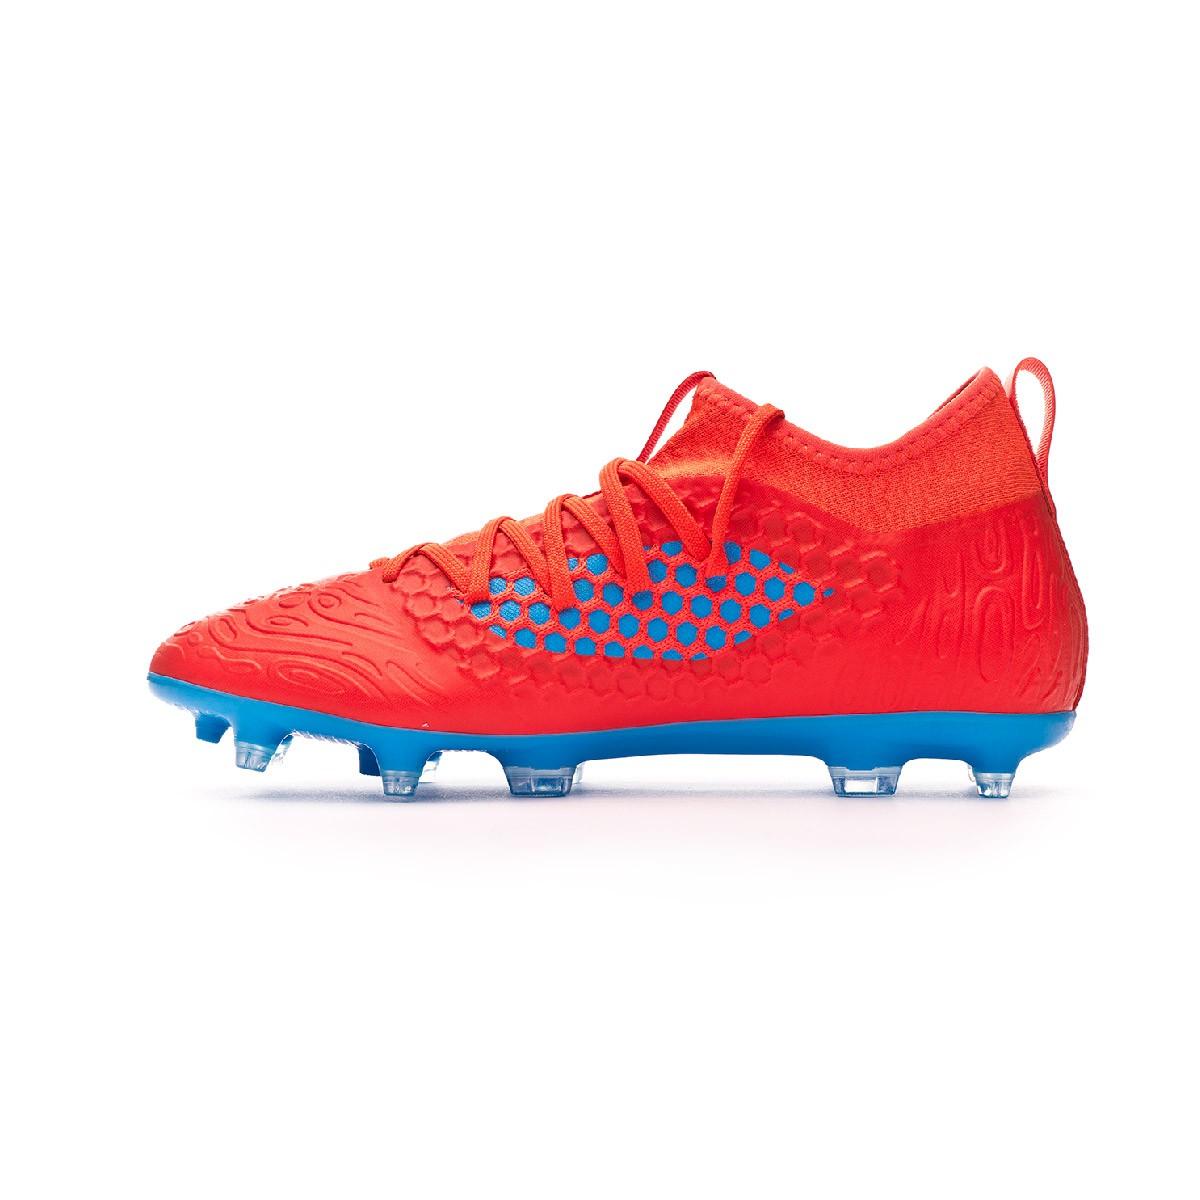 101c43838ddca Chuteira Puma Future 19.3 Netfit FG/AG Red blast-Bleu azur - Loja de  futebol Fútbol Emotion